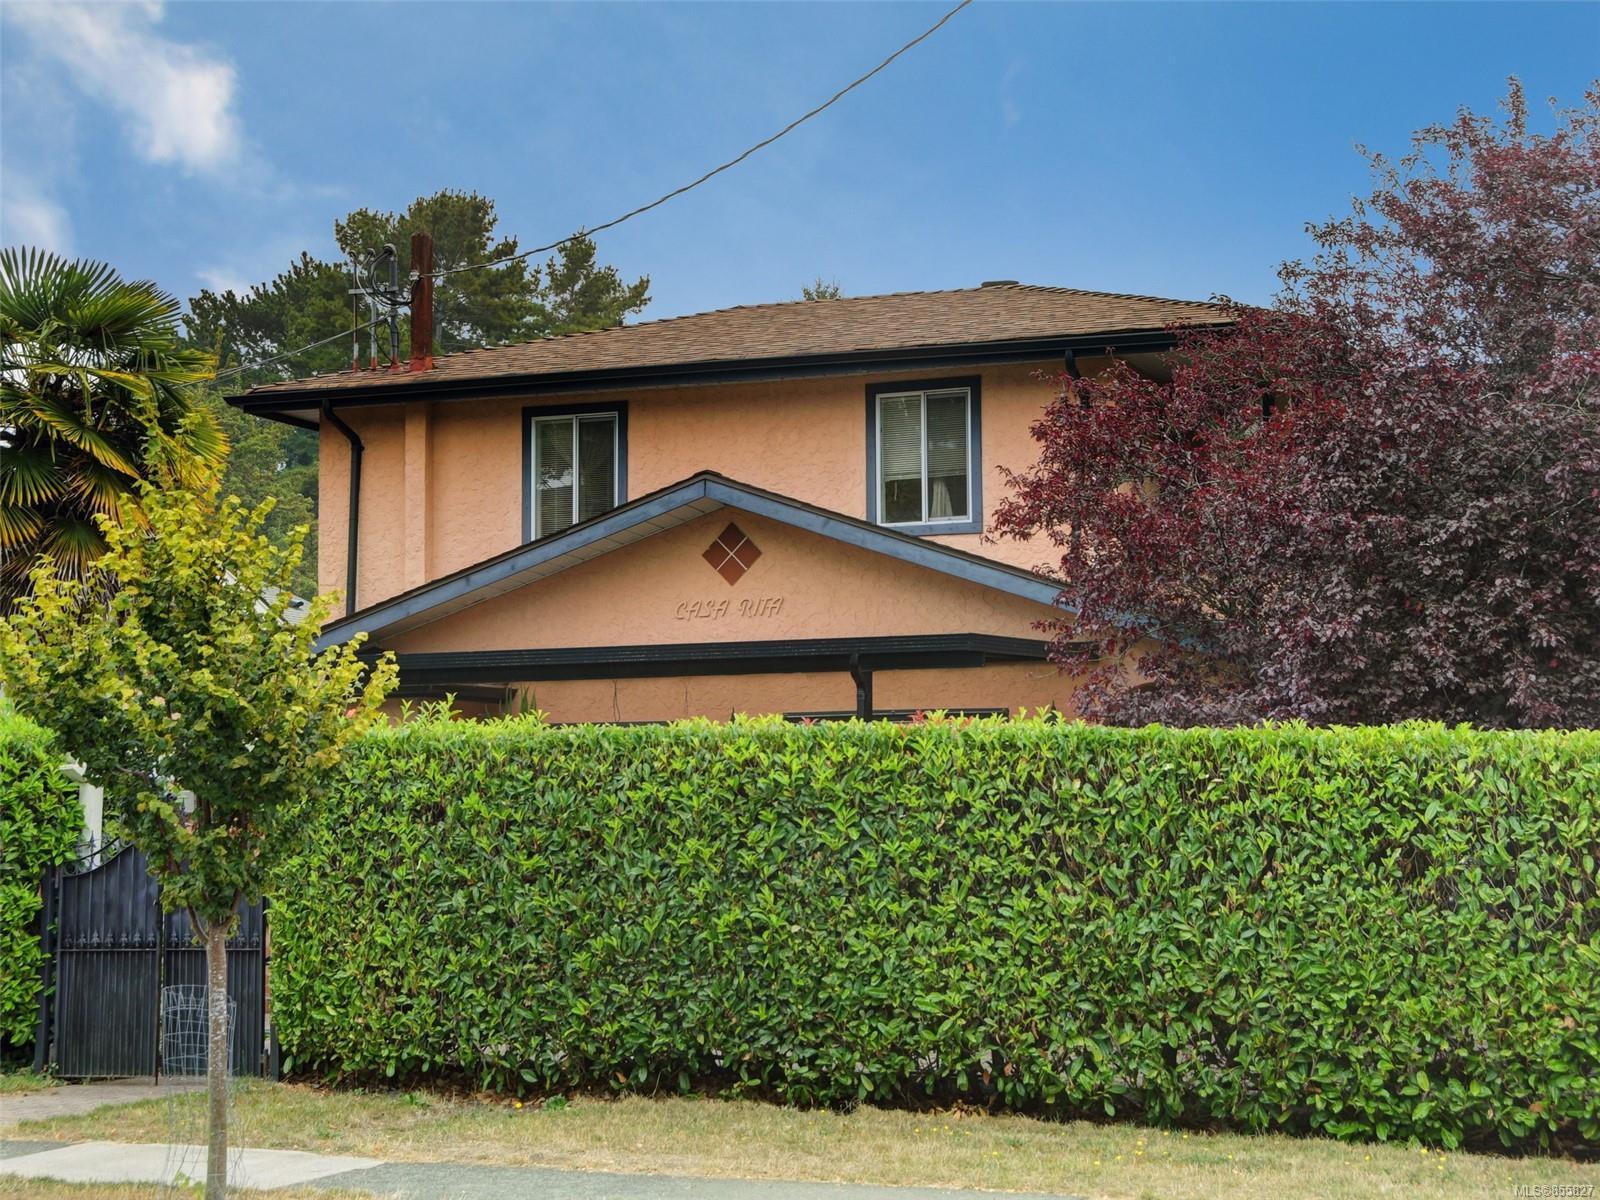 Main Photo: 341 Linden Ave in : Vi Fairfield West Half Duplex for sale (Victoria)  : MLS®# 855827